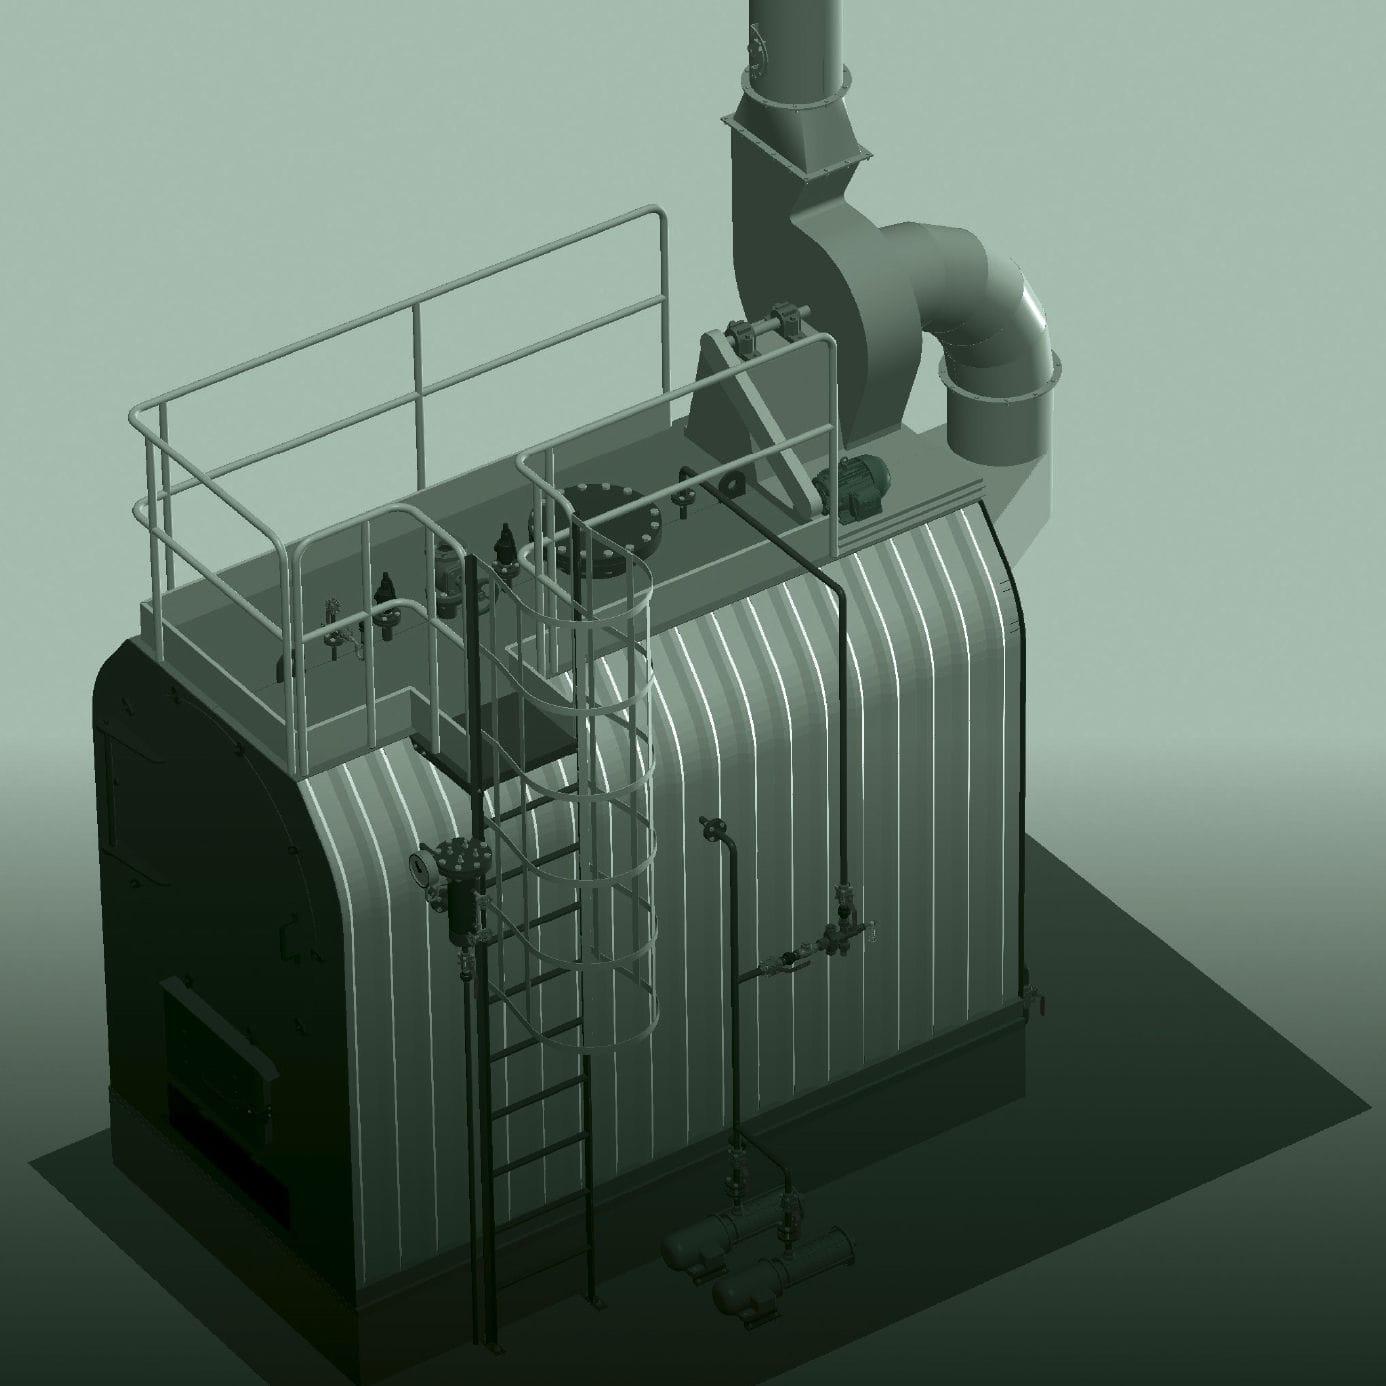 Kessel / gesättigter Dampf / Holz / kompakt - VULCANO series ...